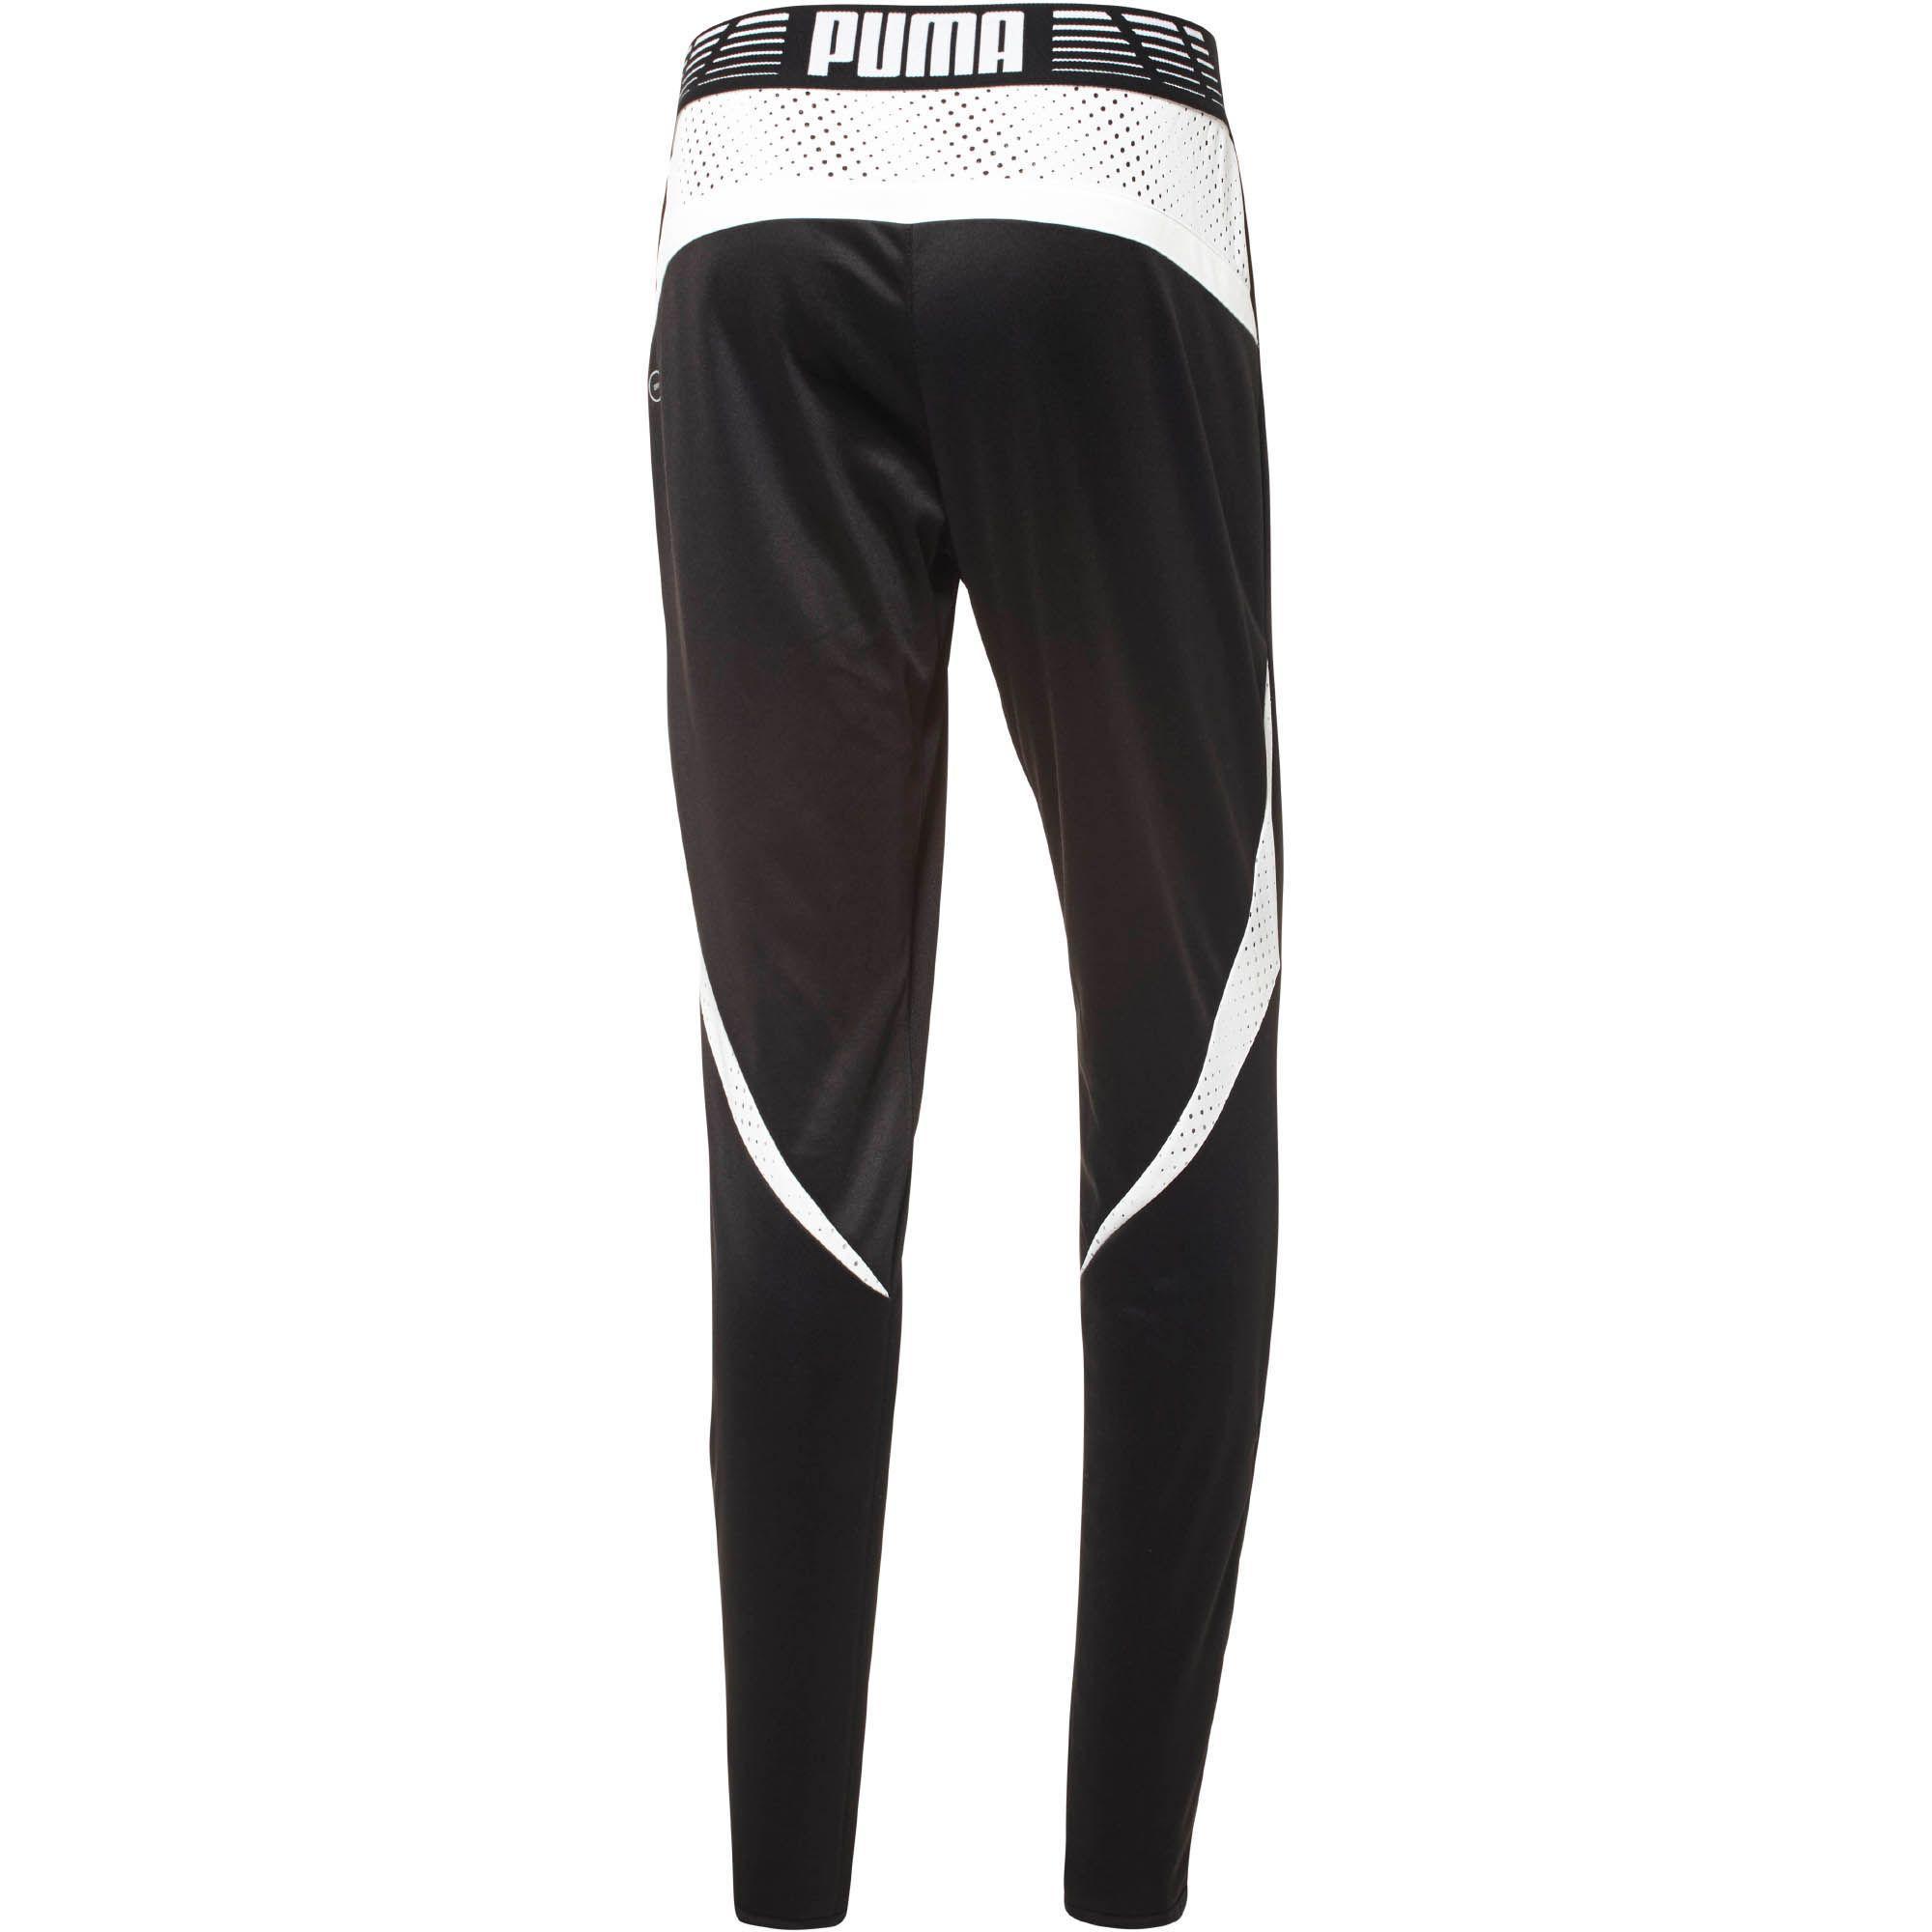 d71637c81c93 Lyst - PUMA Flicker Men s Training Pants in Black for Men